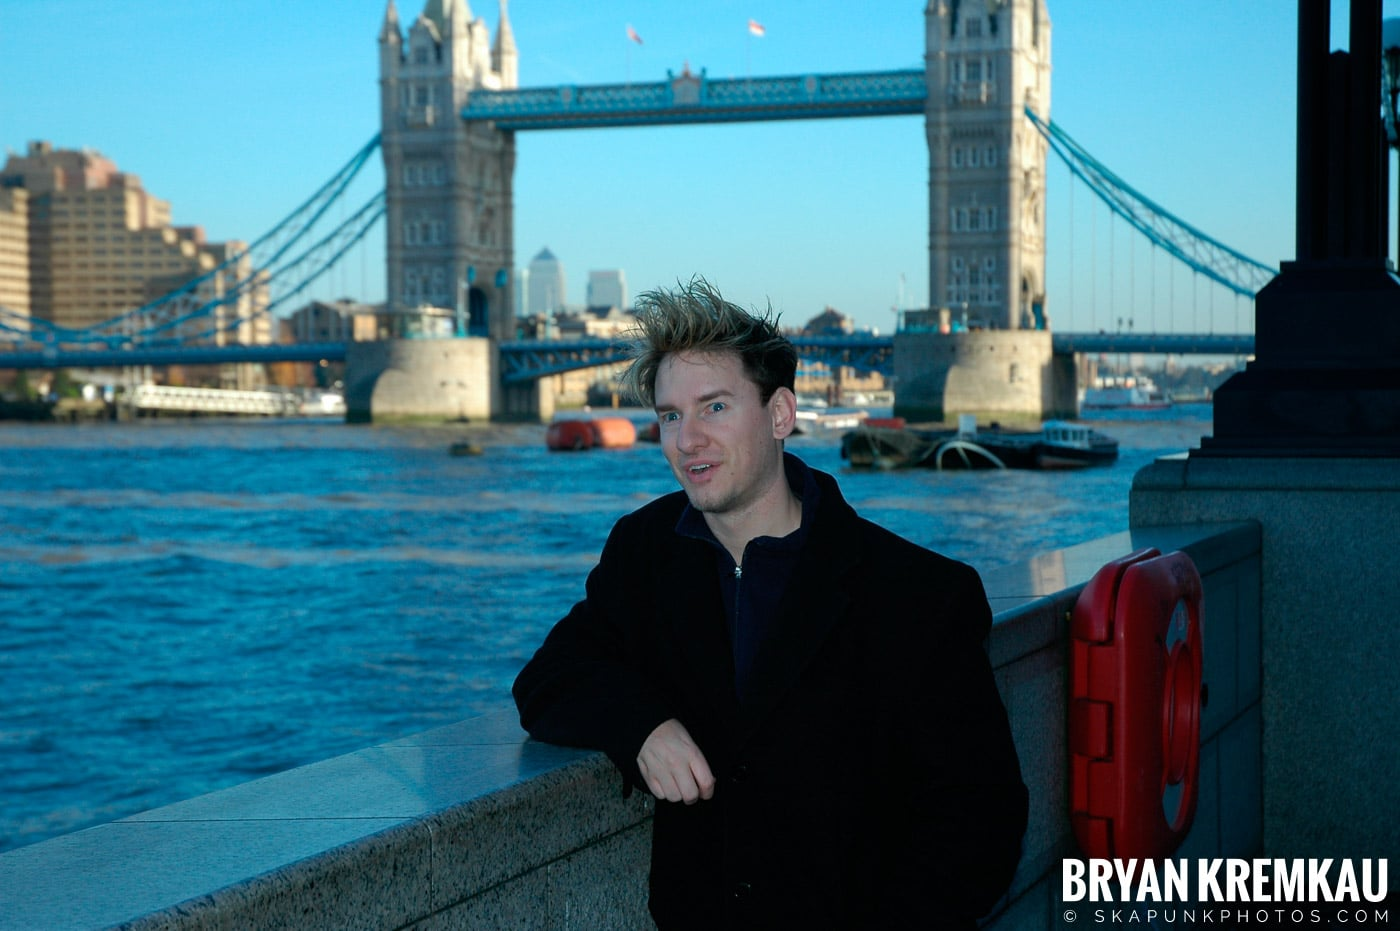 London, England - Day 4 - 12.19.05 (17)